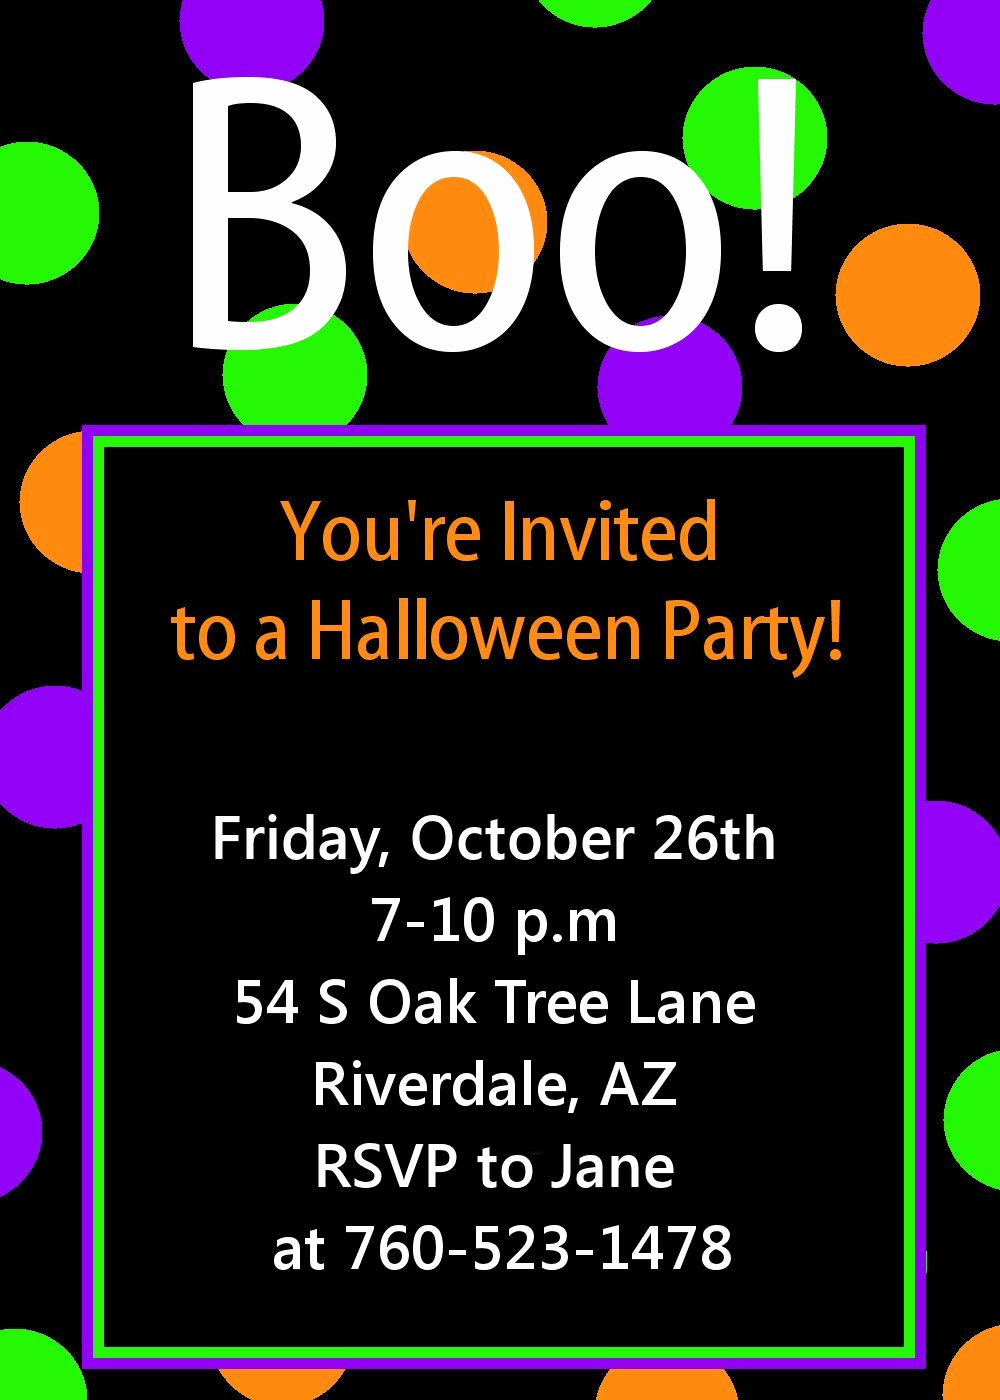 Halloween Party Invites Templates Luxury Halloween Party Invitation Printable